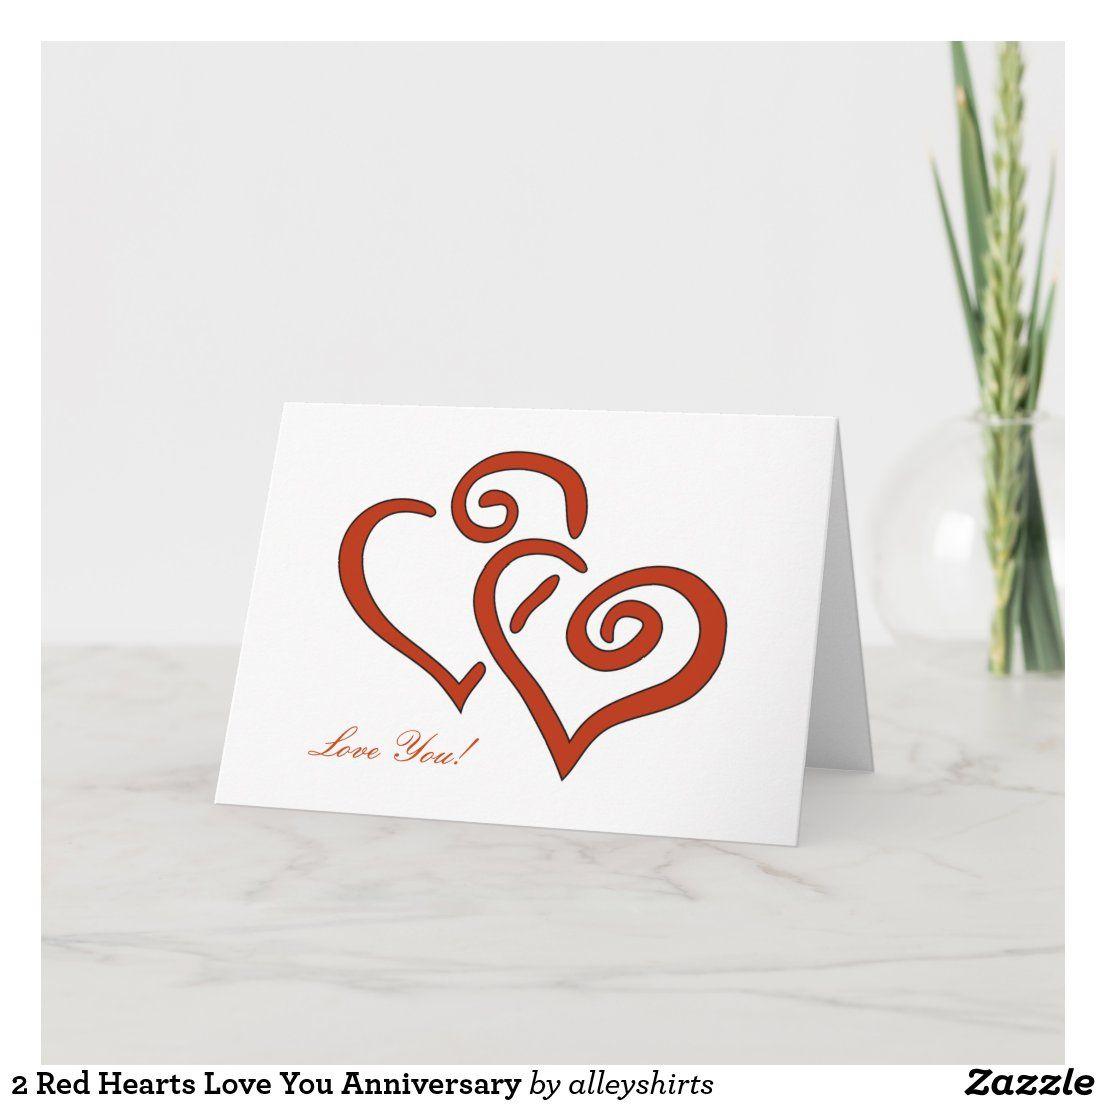 2 Red Hearts Love You Anniversary Card Zazzle Com Anniversary Cards Happy Anniversary Cards Holiday Design Card